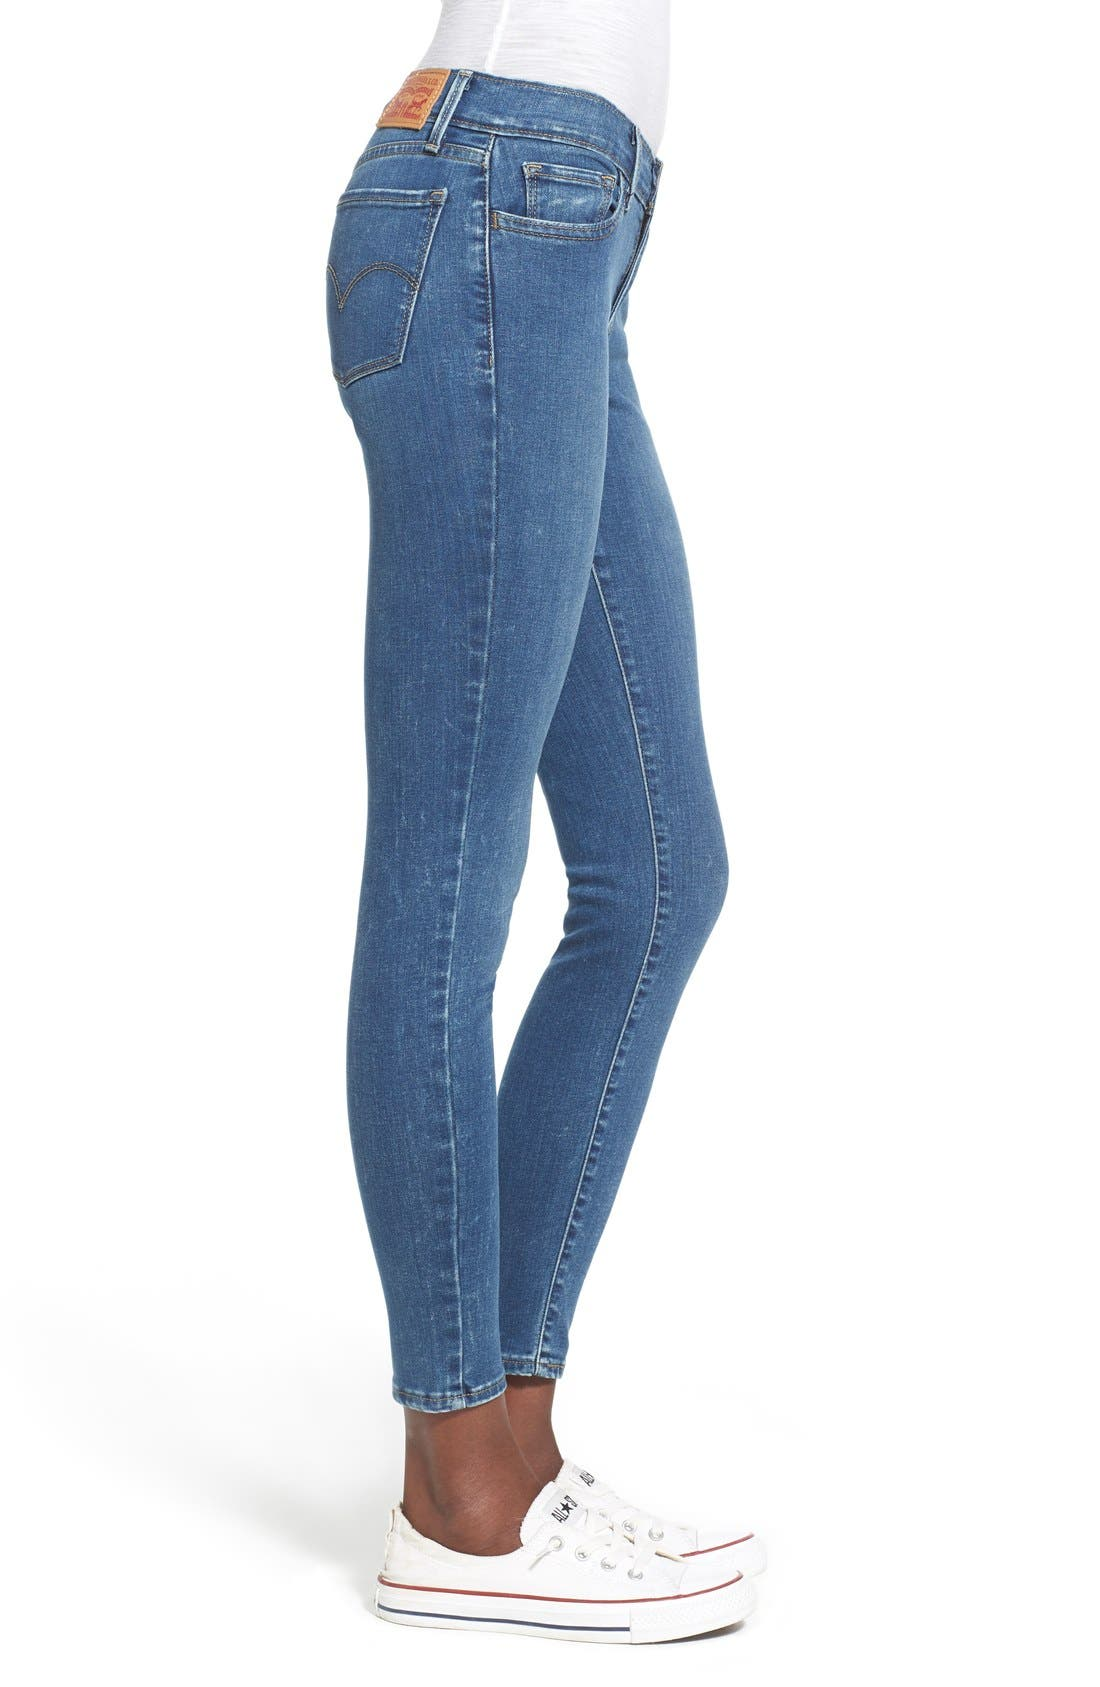 Alternate Image 3  - Levi's® '710' Super Skinny Jeans (Pacific Drive)